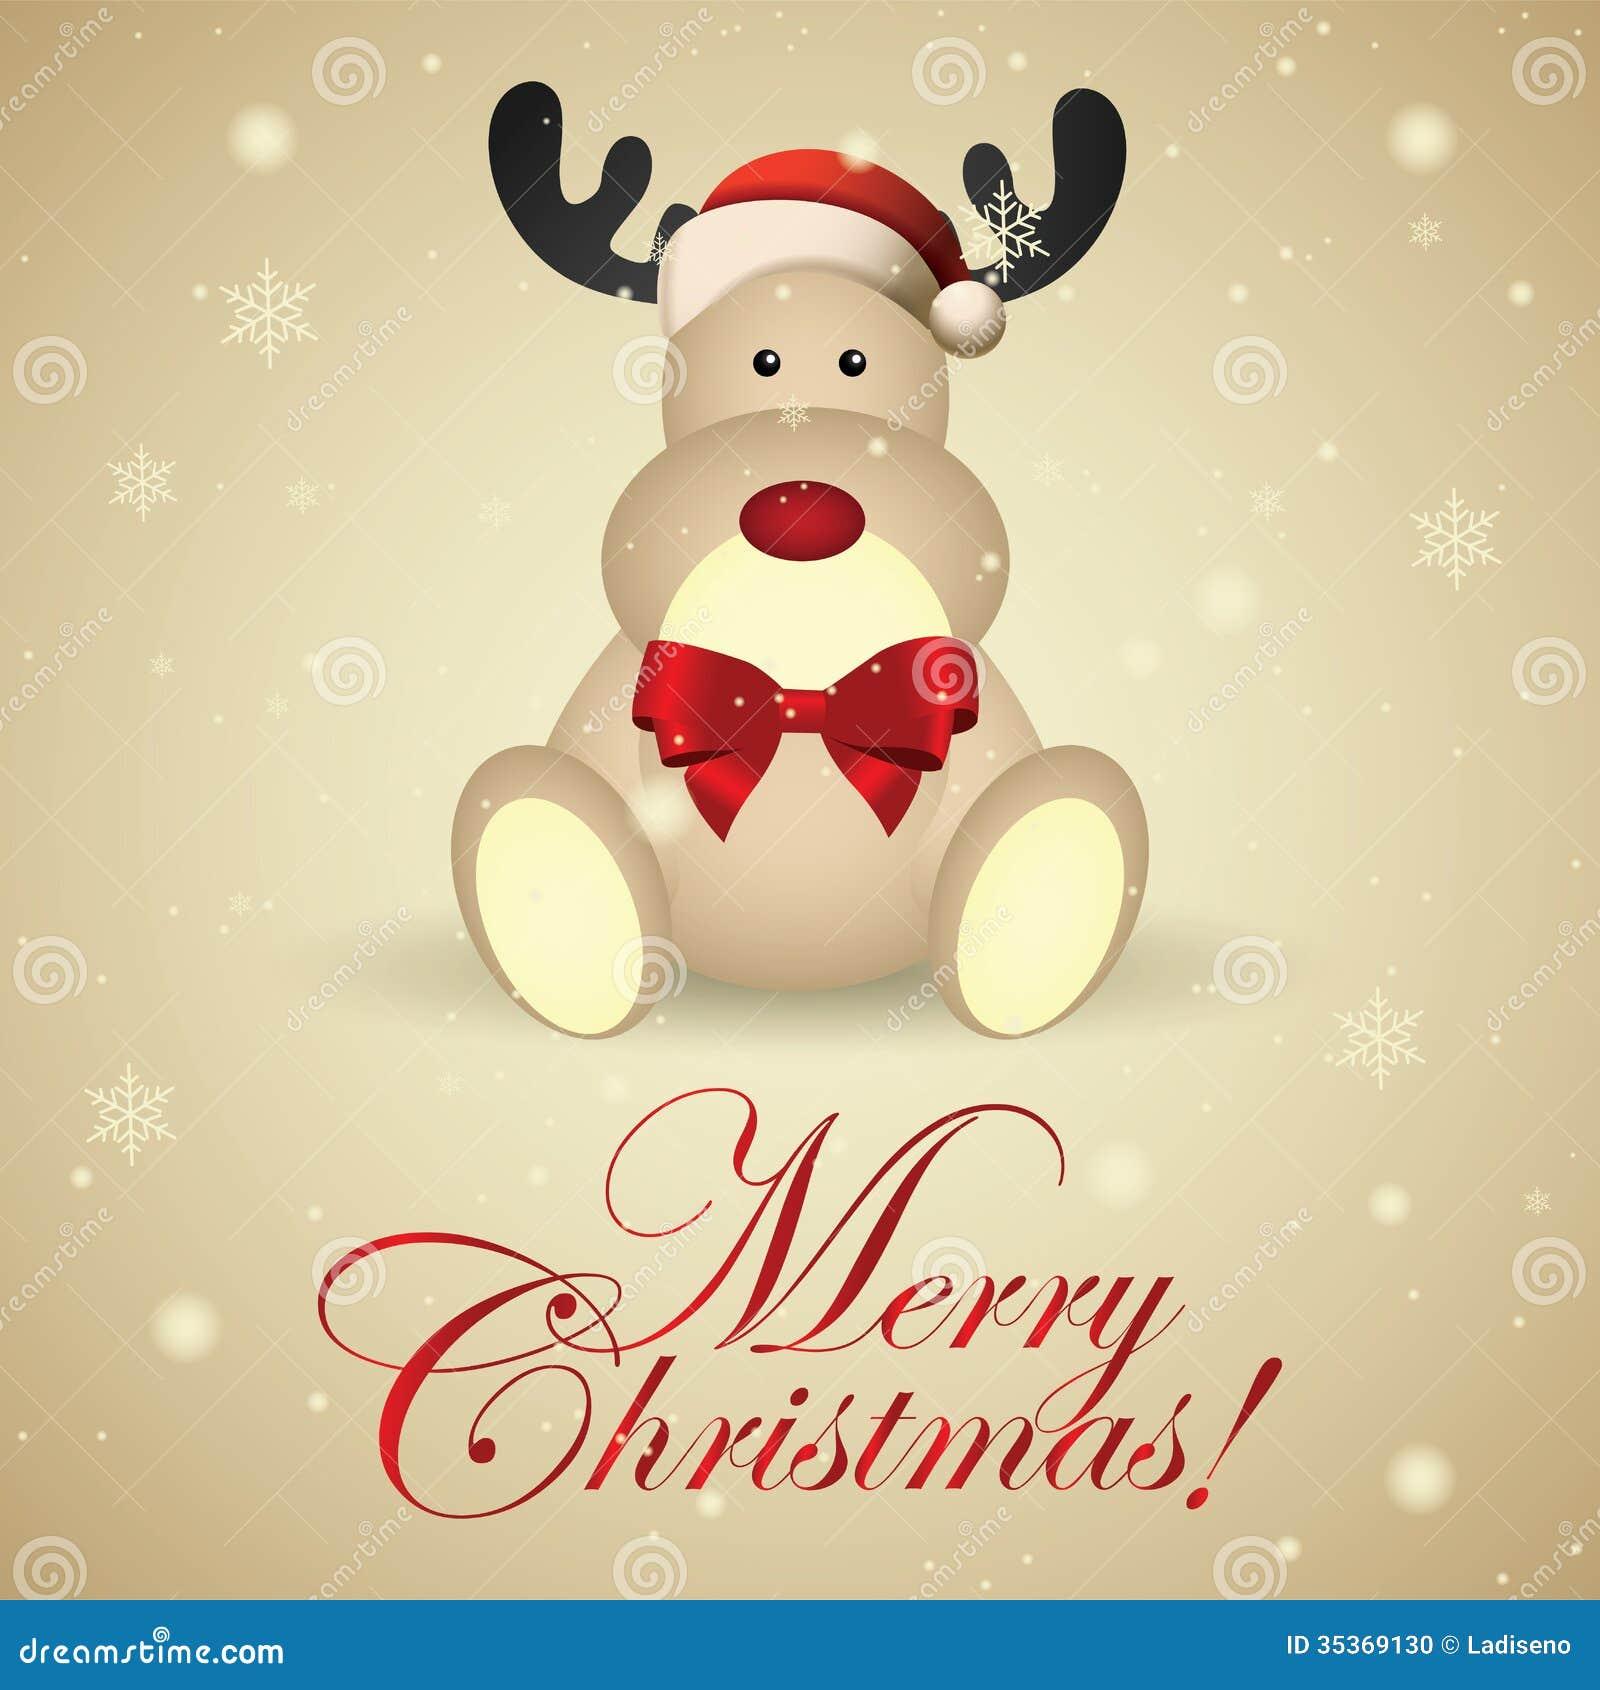 Merry Merry Christmas.Merry Christmas Stock Vector Illustration Of Polar